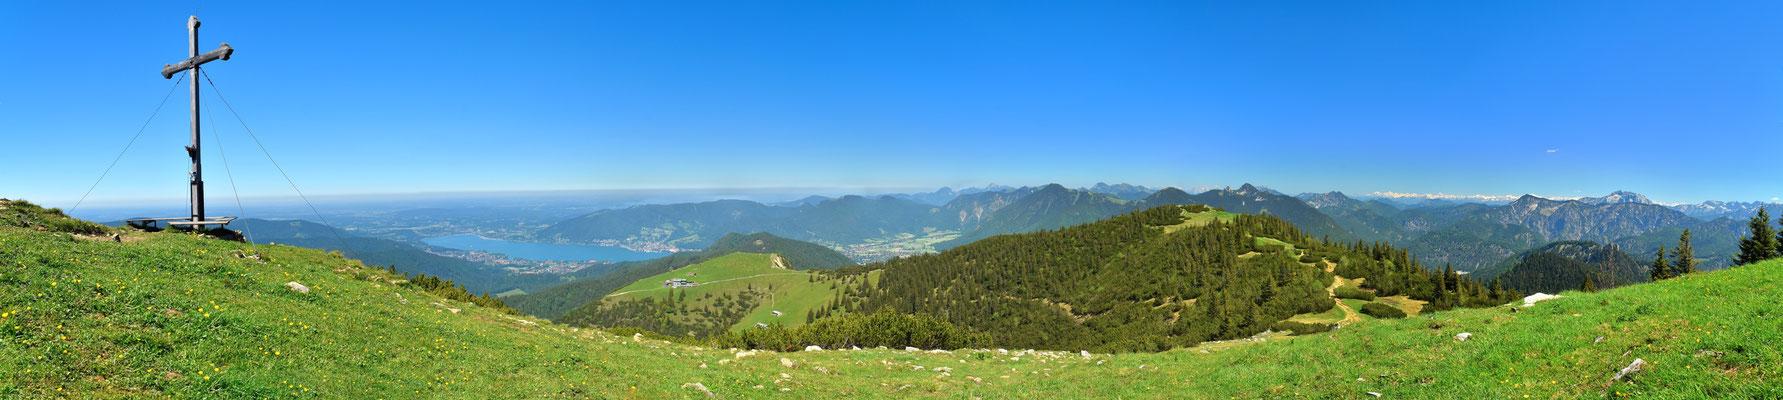 Panorama - Drohnenfoto - Landschaft - Bayern - Berge - Alpen - Sommer - Ausflug - Wanderung - Hirschberg